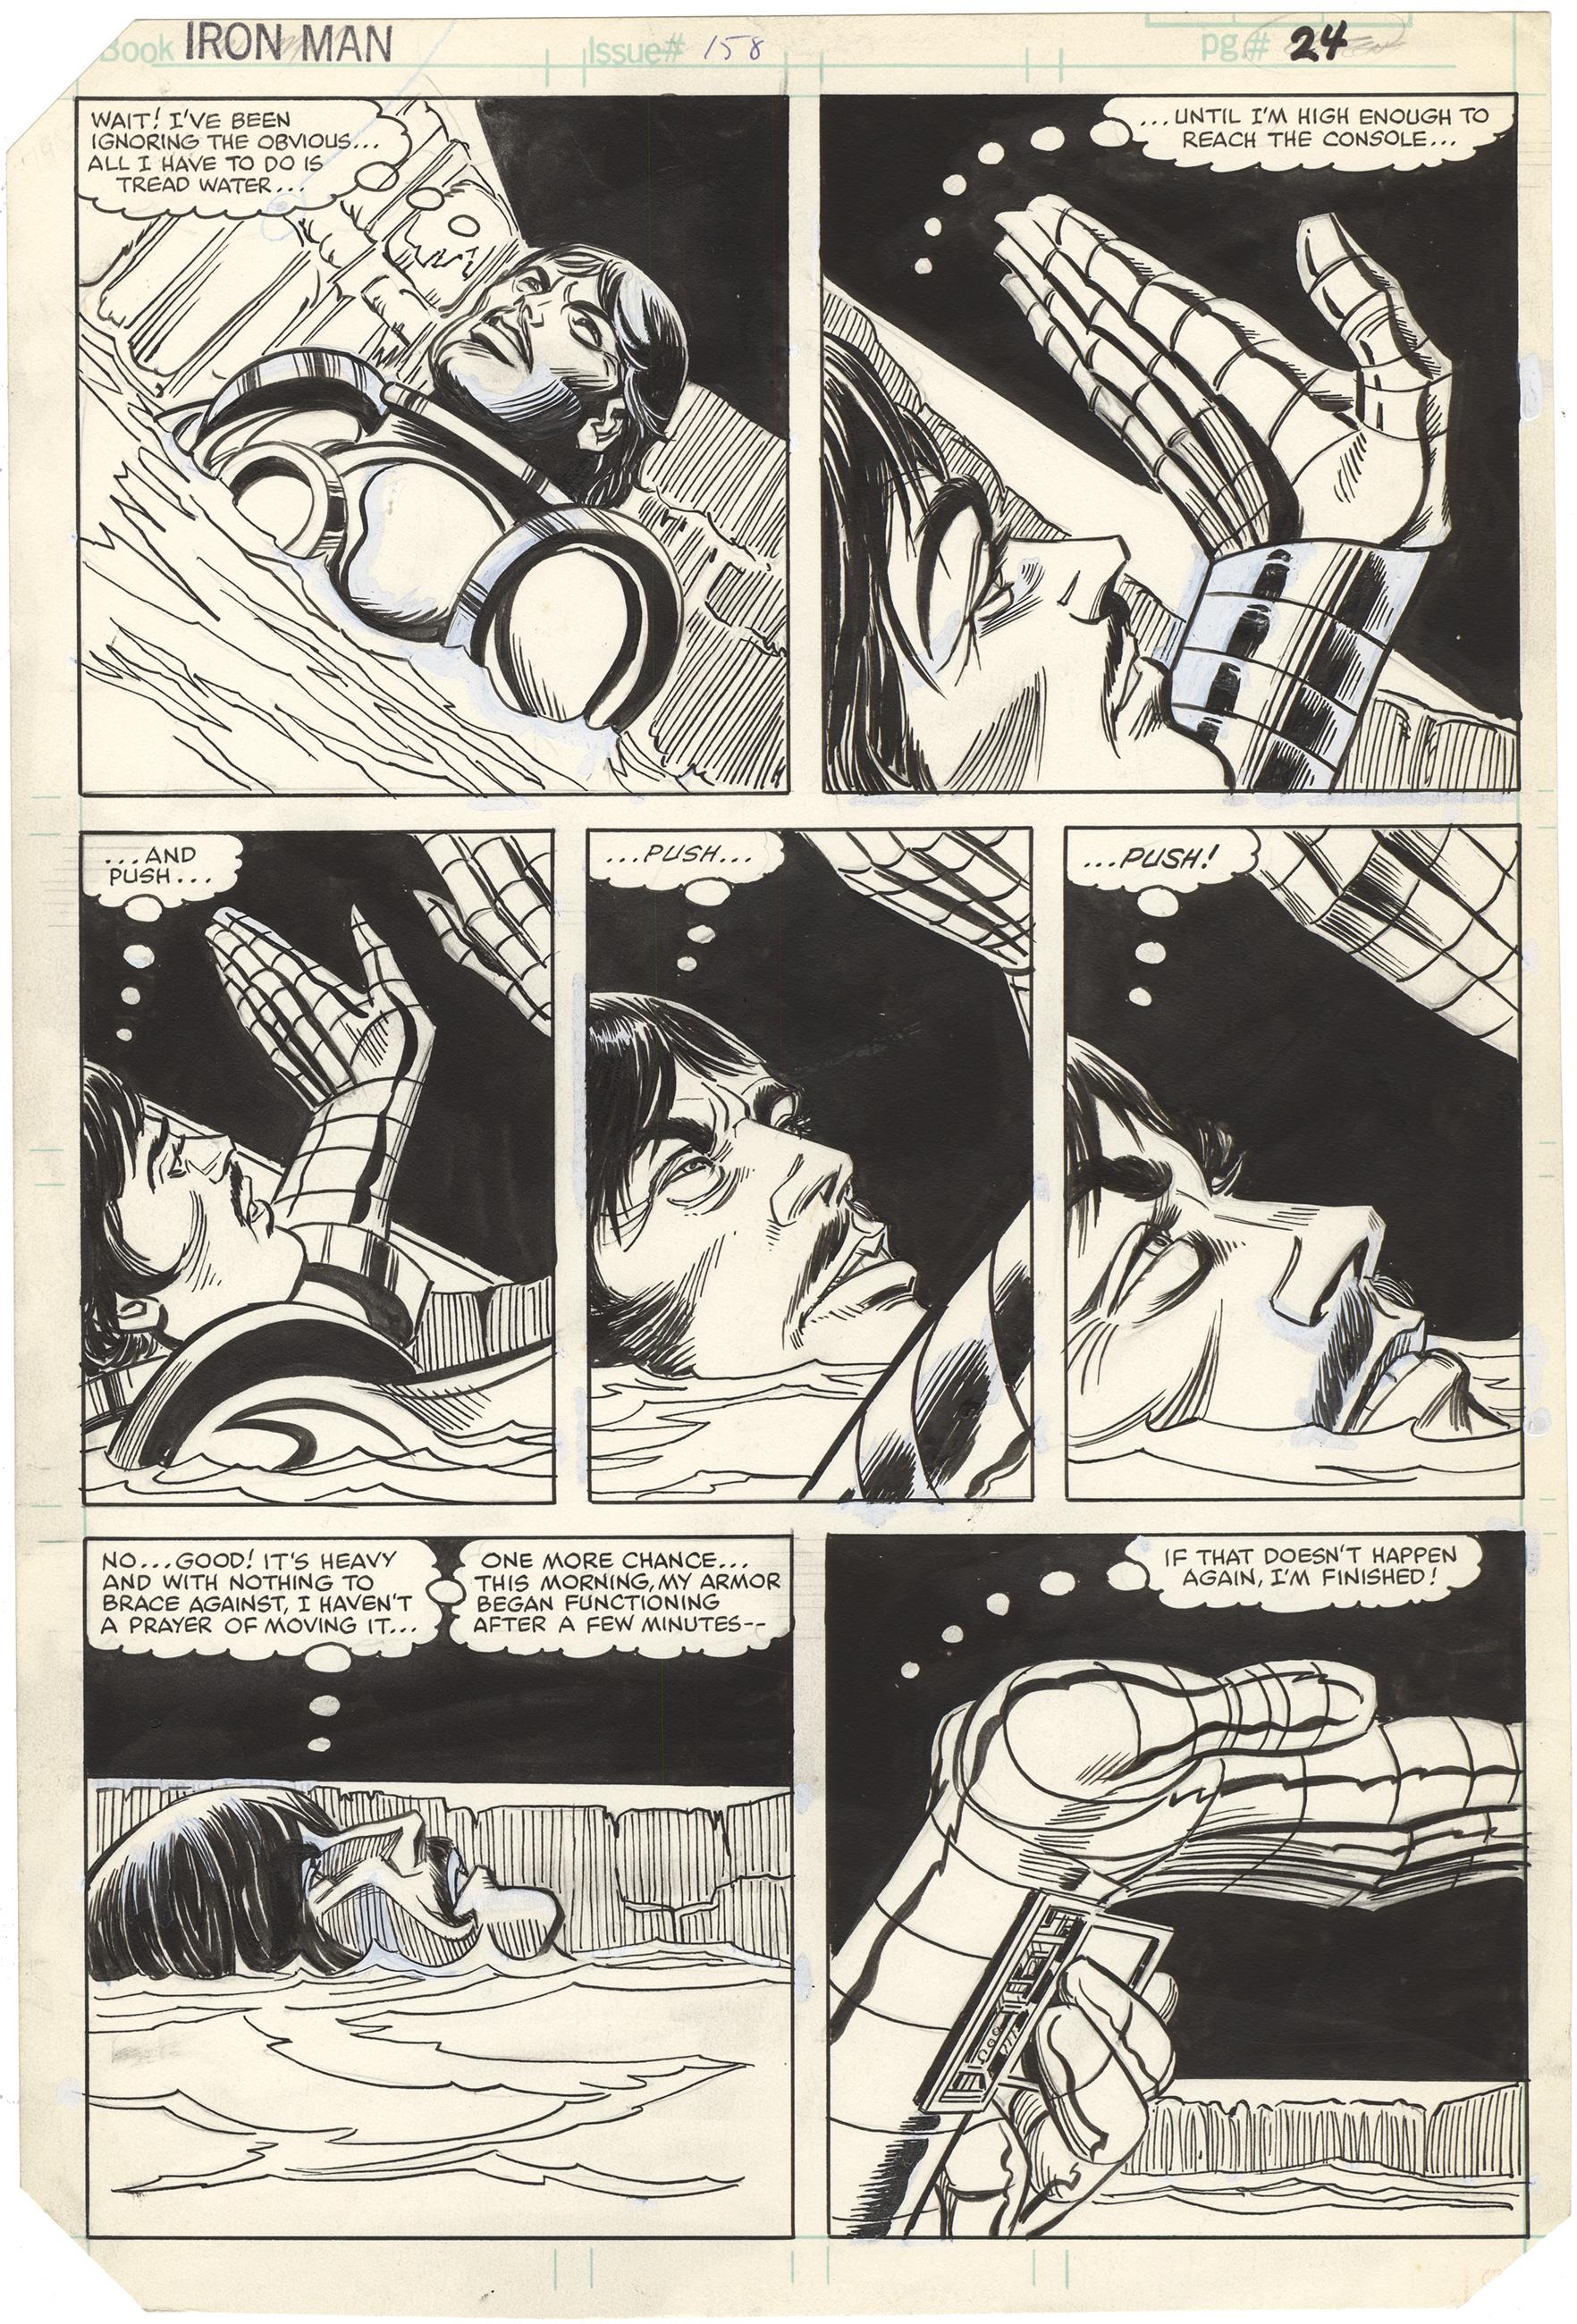 Iron Man #158 p24